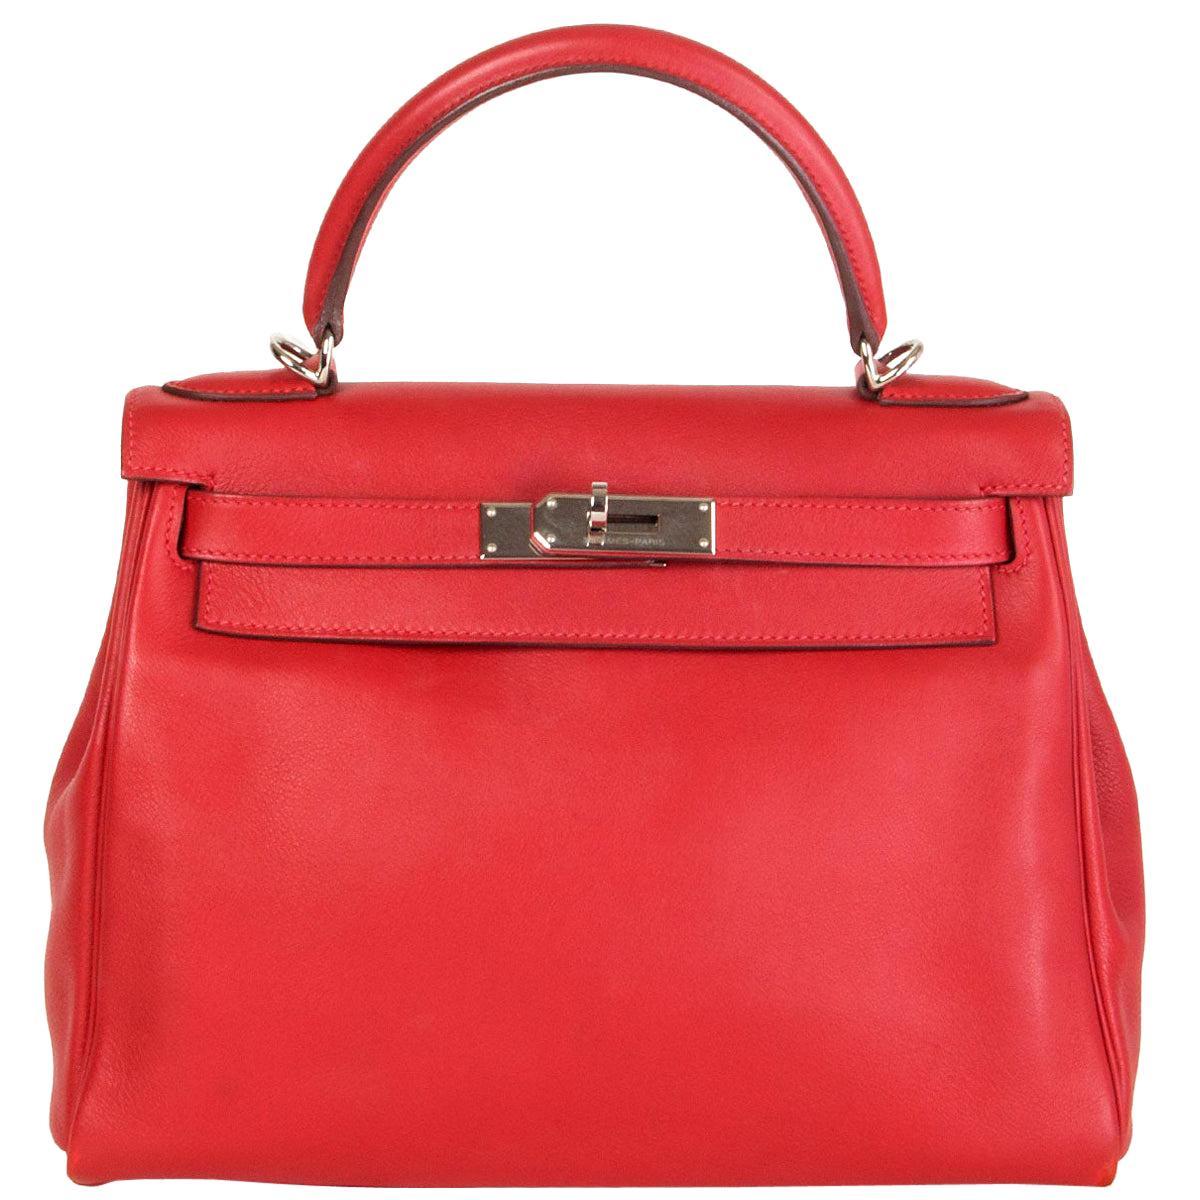 HERMES Rouge Tomate red Swift leather KELLY 28 RETOURNE Bag Palladium